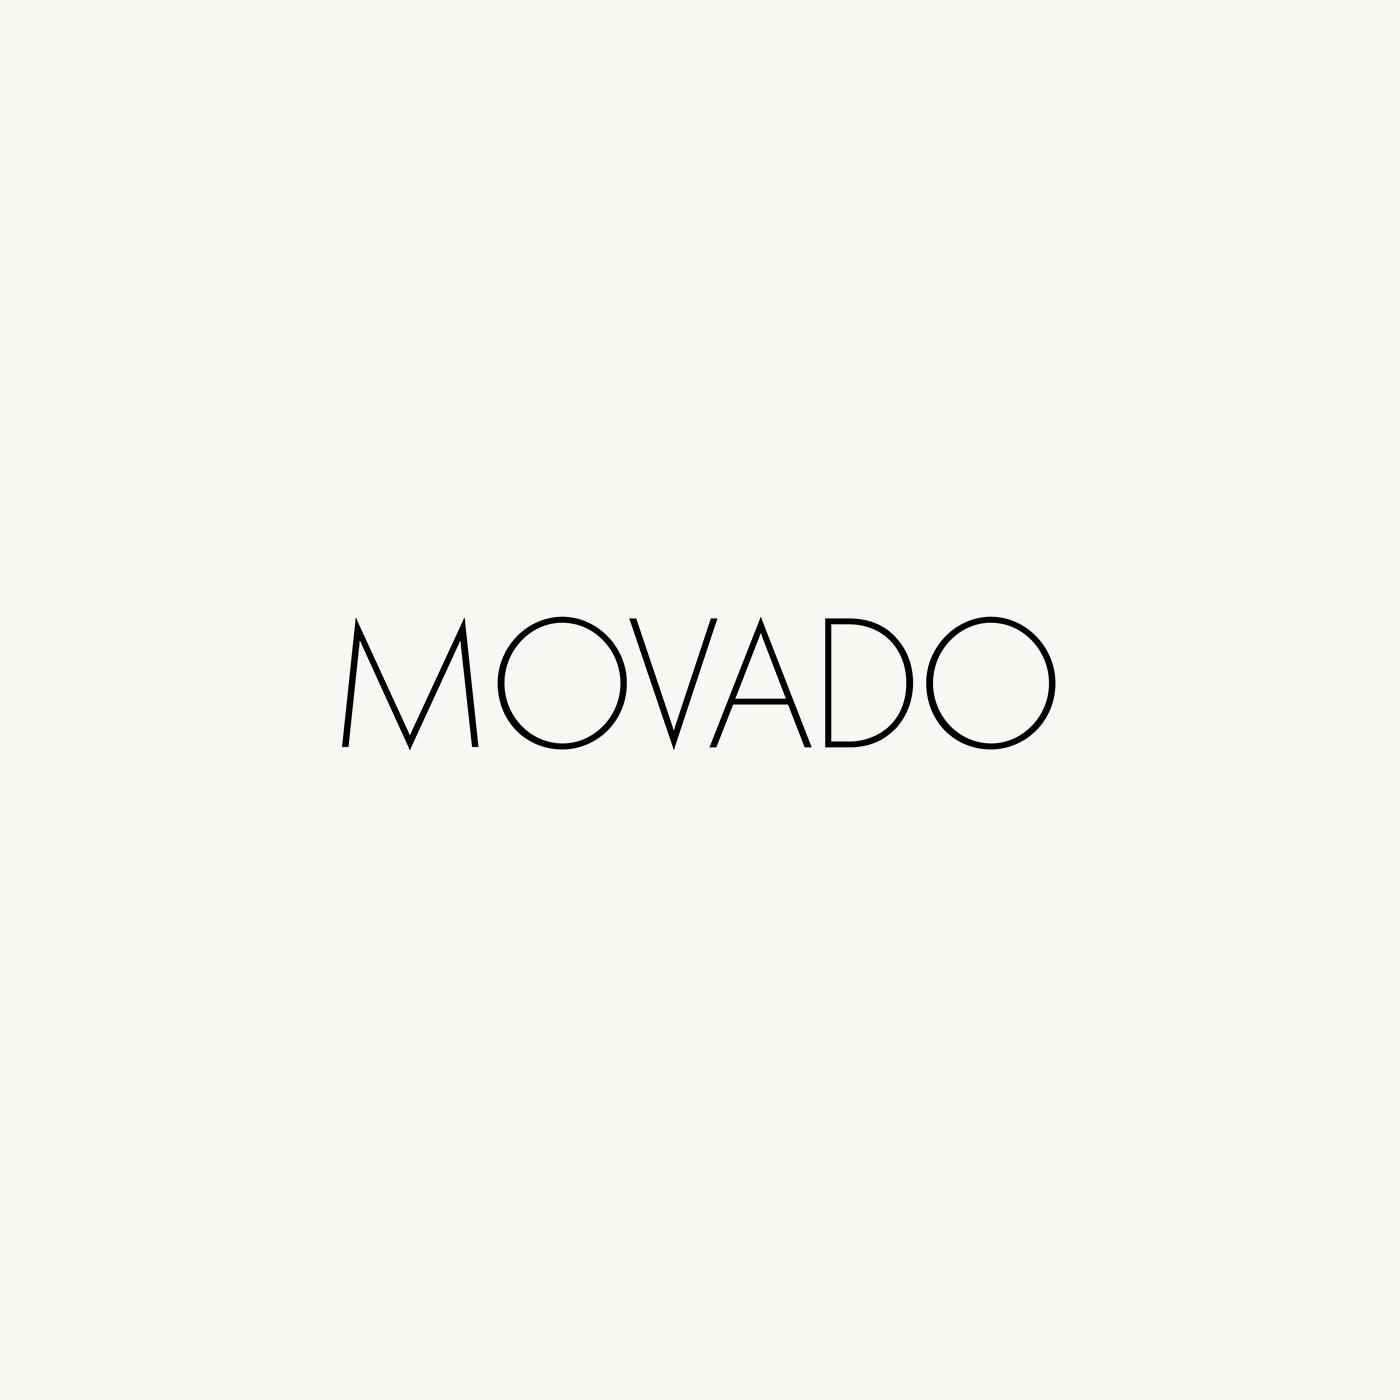 Movado Logo.jpg